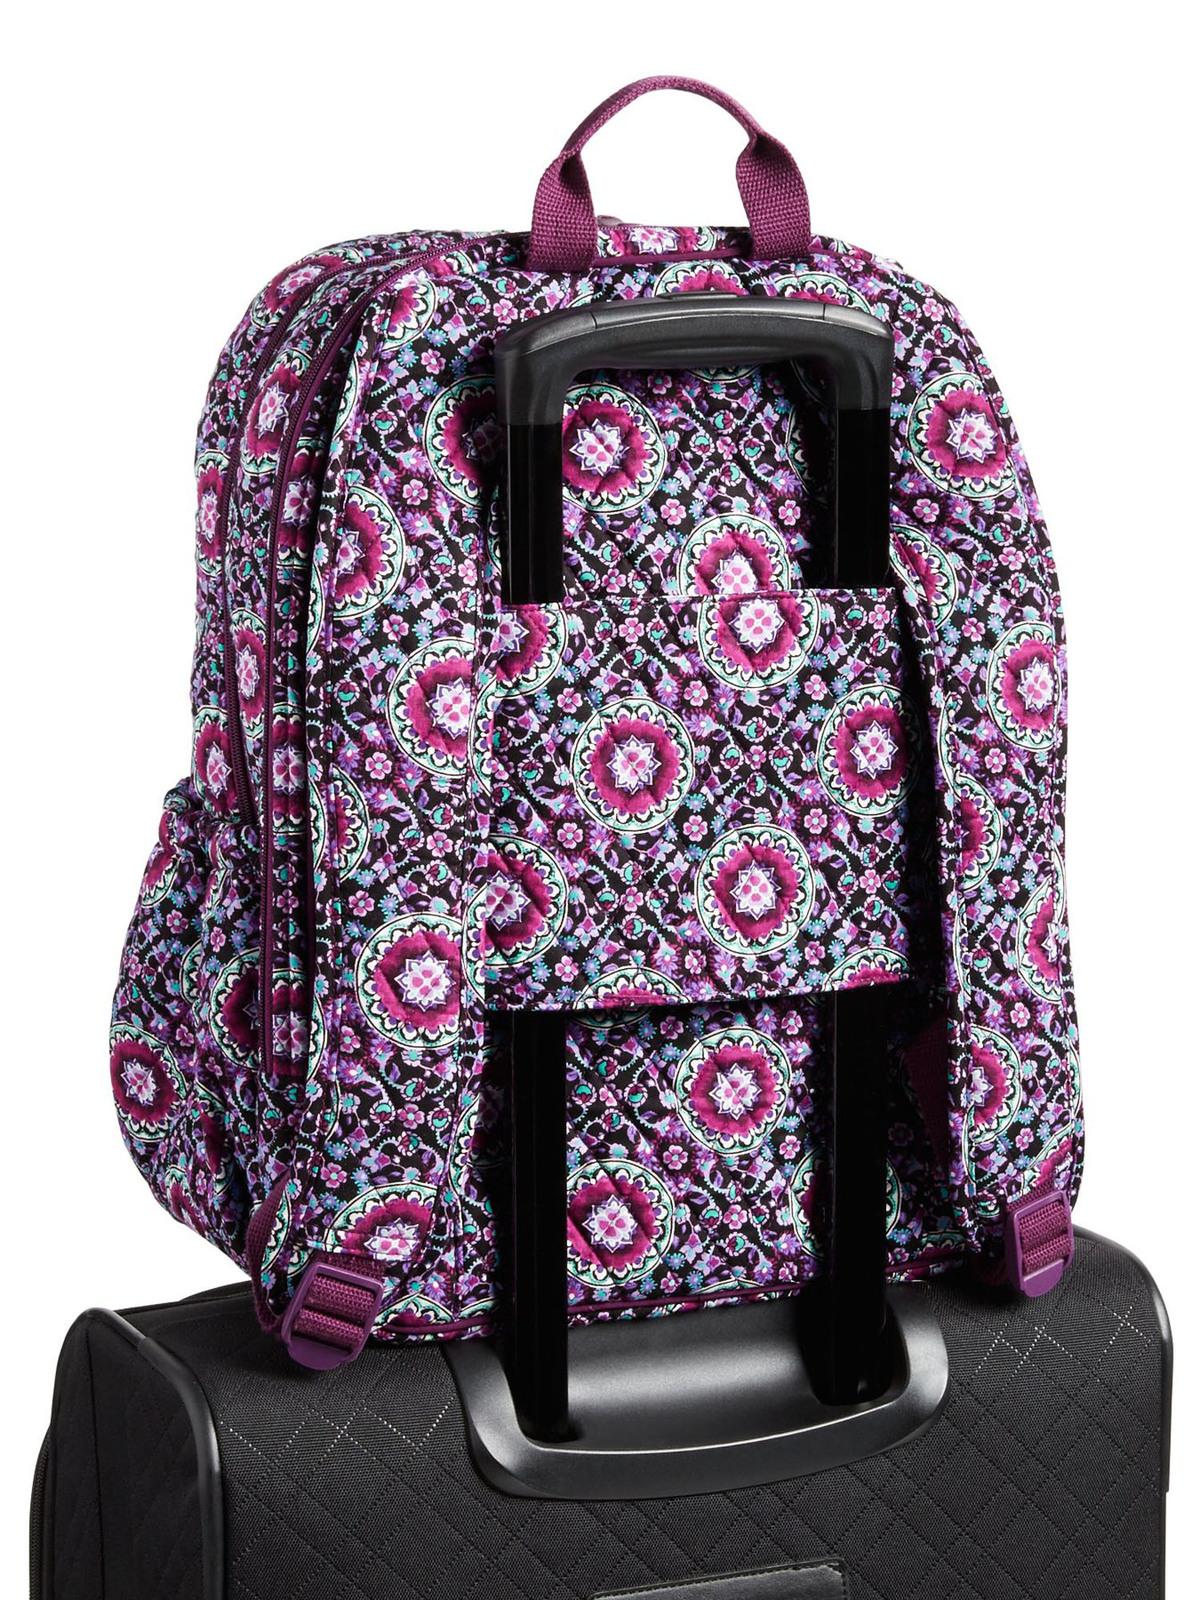 Vera Bradley Signature Cotton Campus Tech Backpack, Lilac Medallion image 6